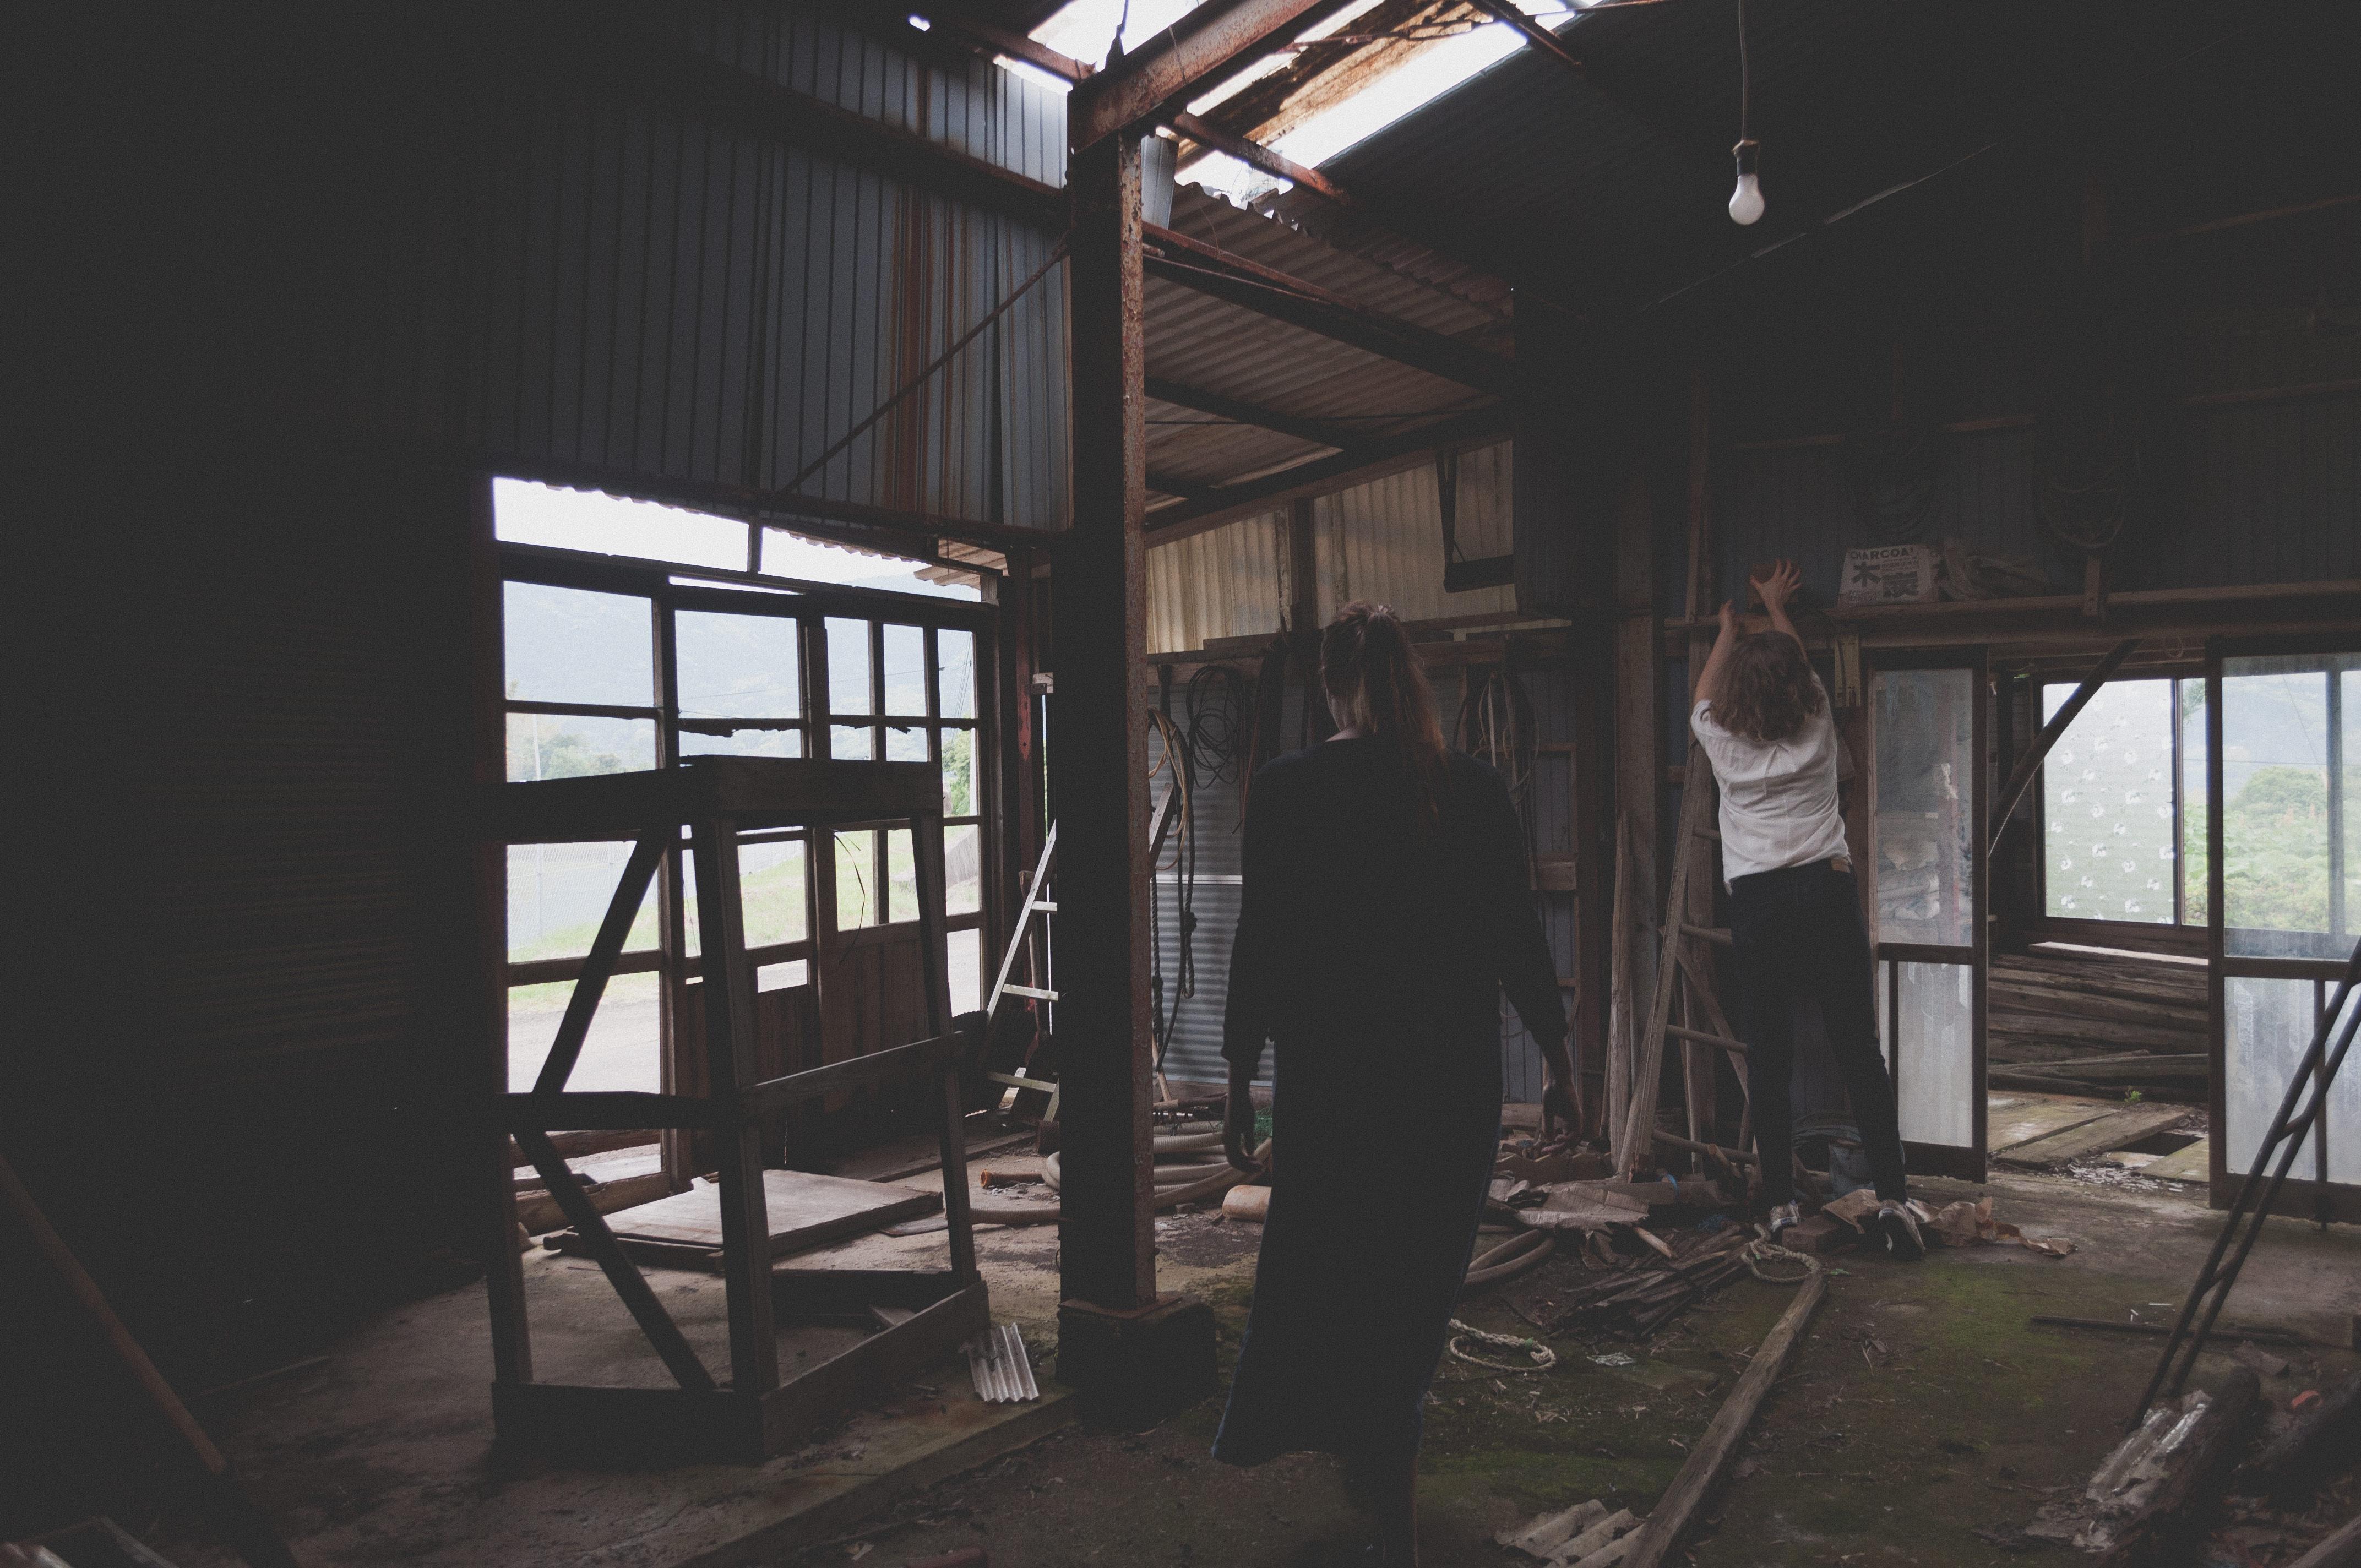 Huis Donker Hout : Gratis afbeeldingen licht architectuur mensen hout huis